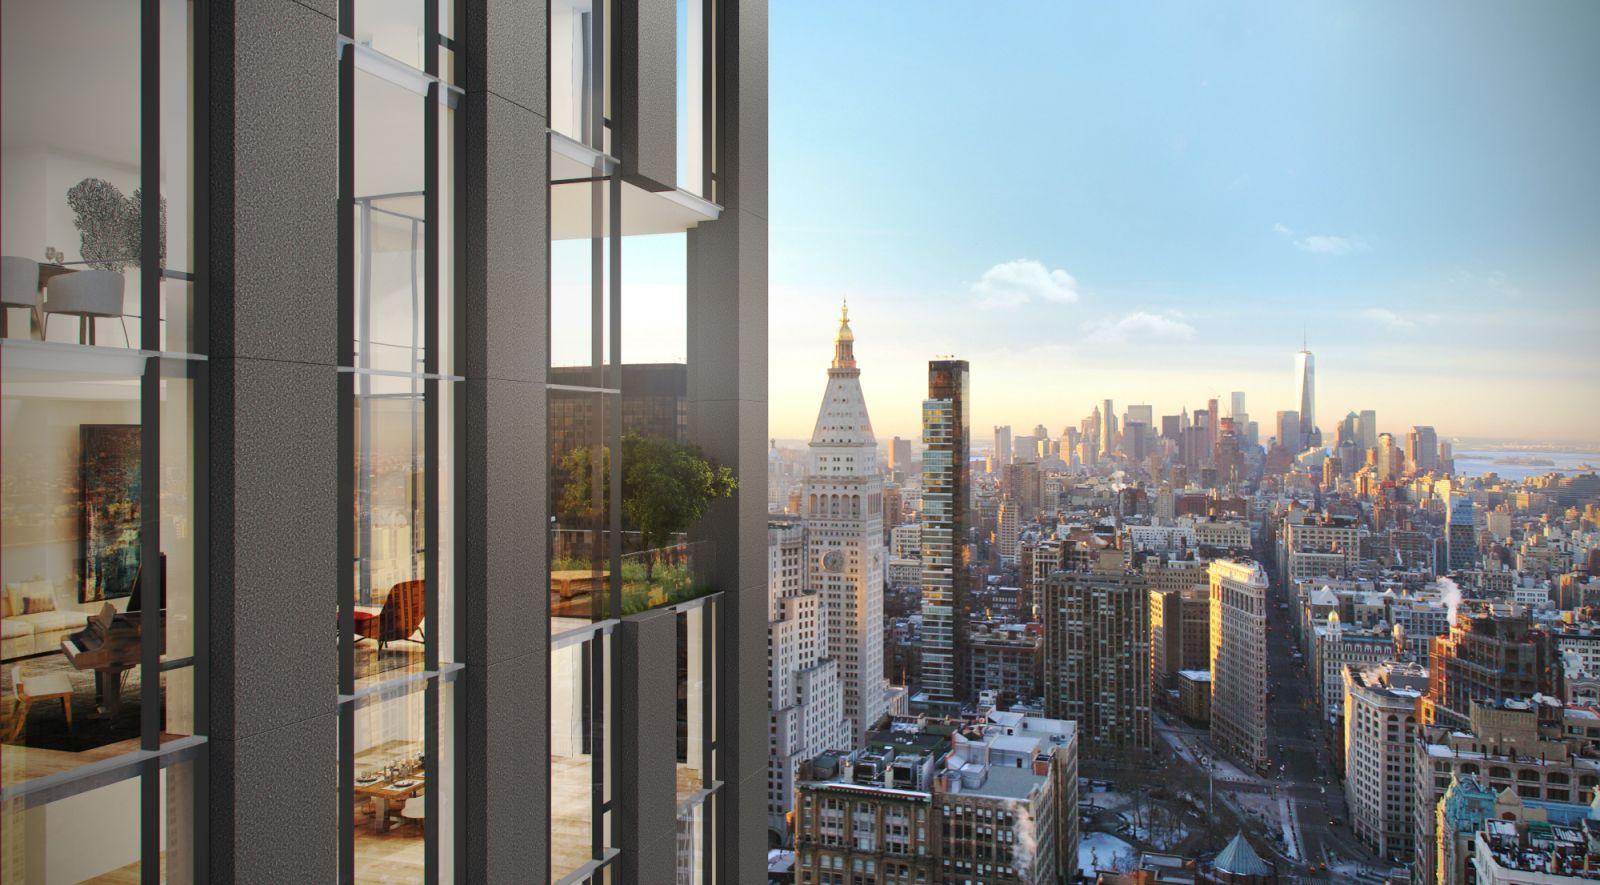 277 Fifth Avenue